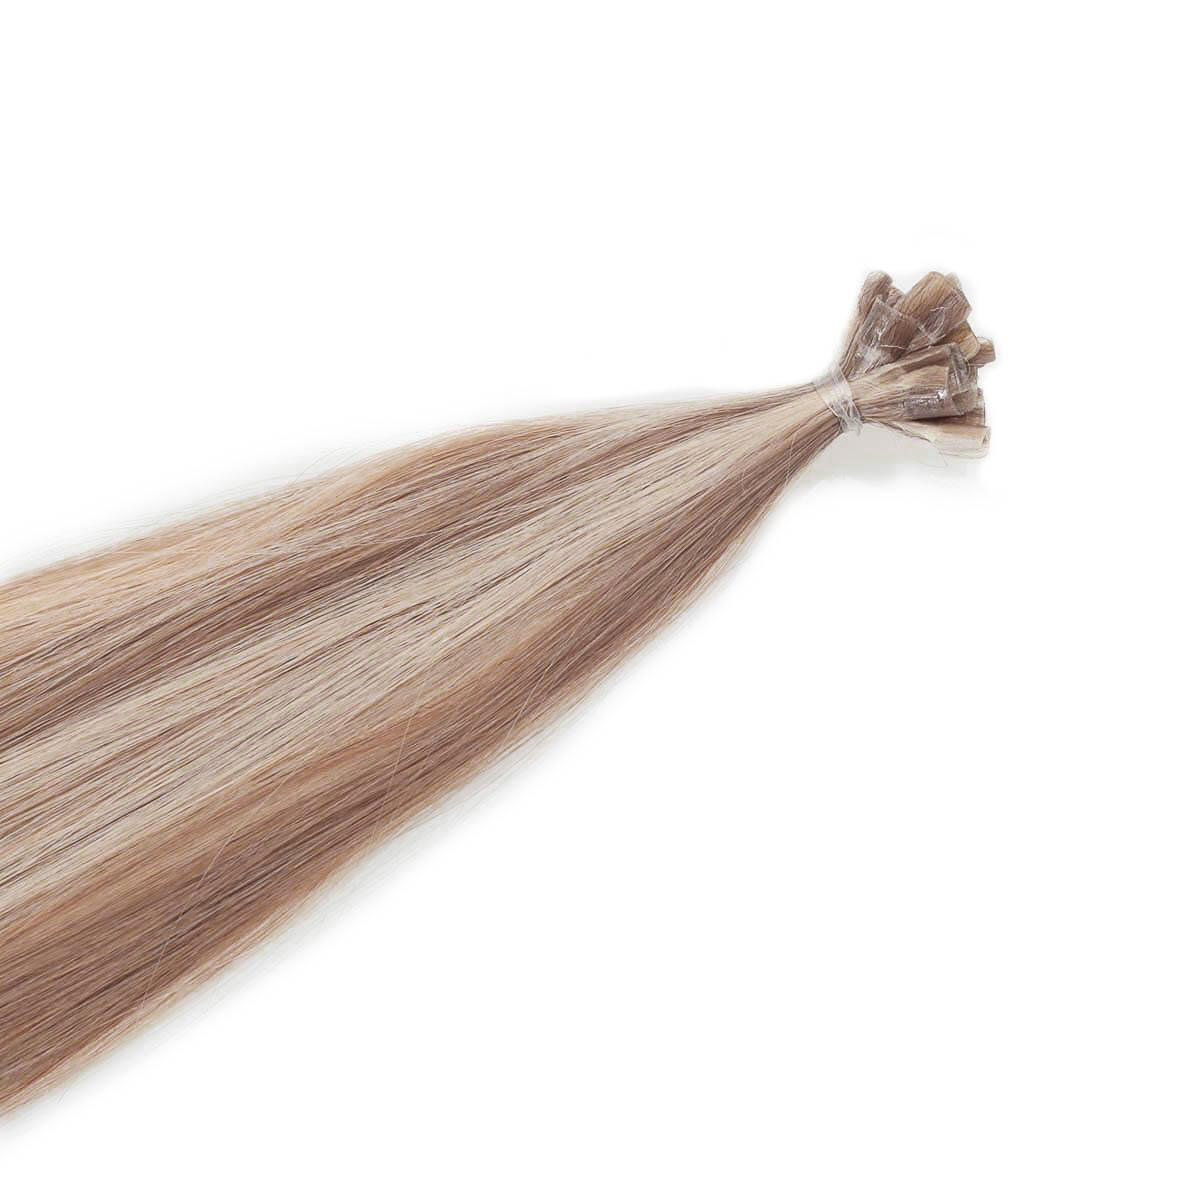 Bondings Premium Glatt M7.3/10.8 Cendre Ash Blonde Mix 60 cm